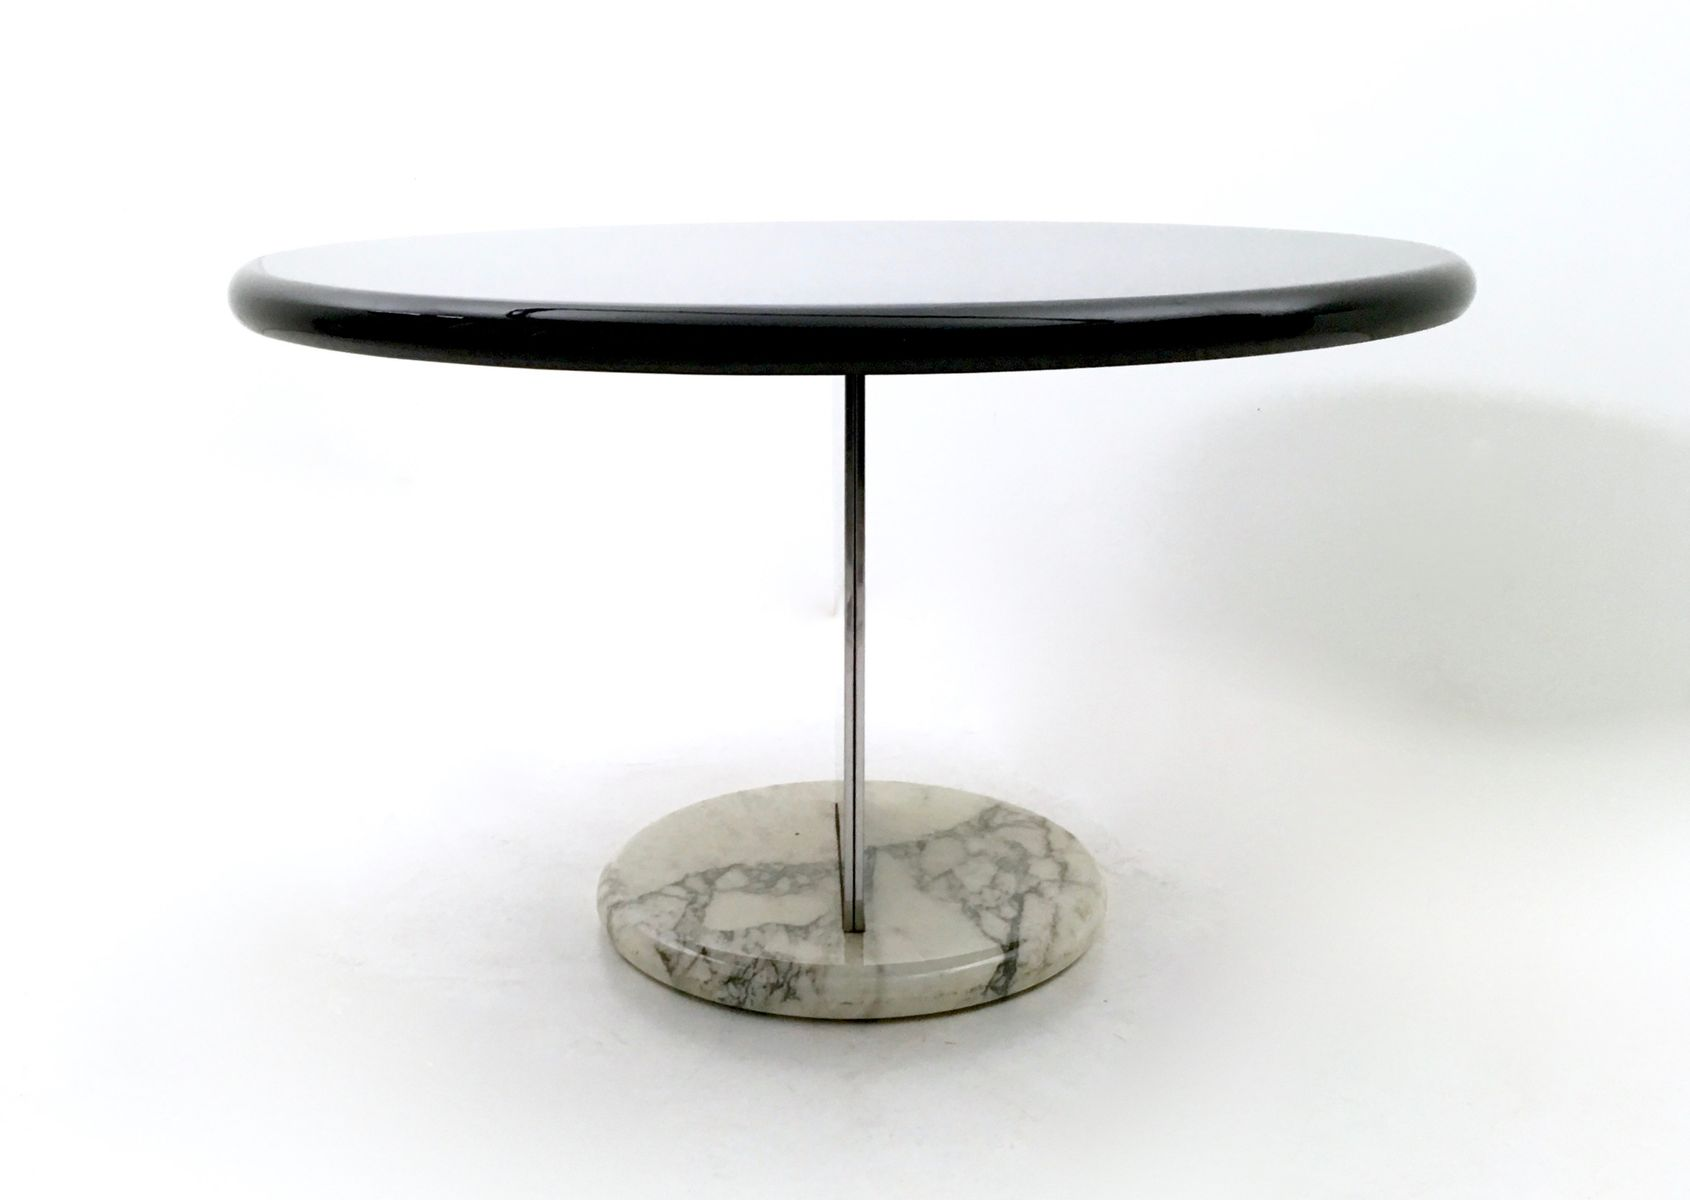 Italian Vintage Carrara Marble Base Dining Table 1970s for sale